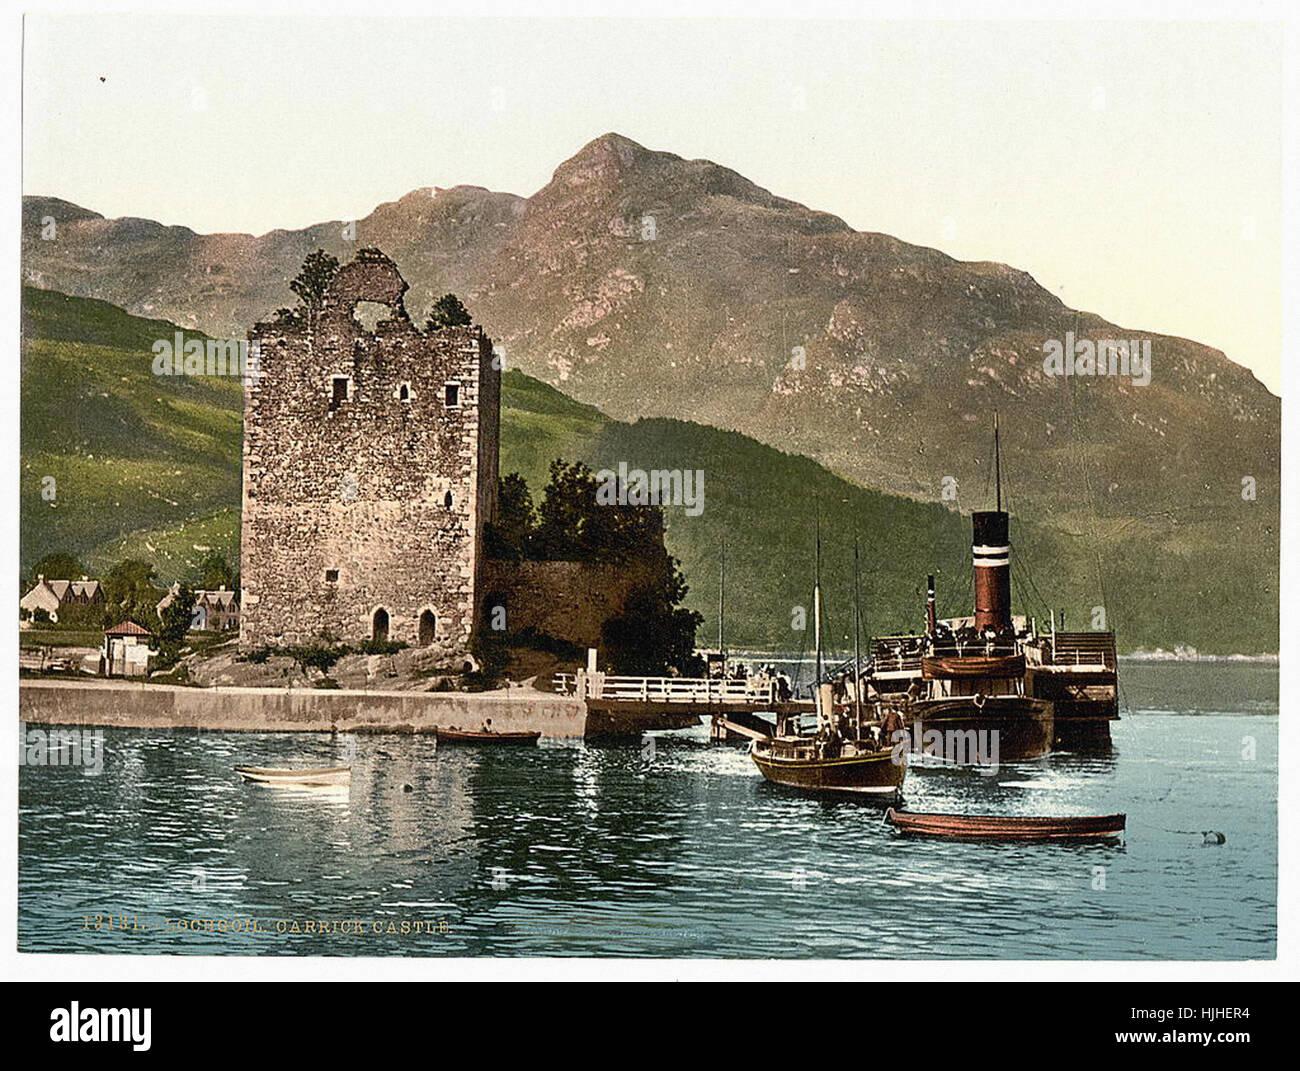 Carrick Castle, Lochgoil (i.e. Loch Goil), Scotland  - Photochrom XIXth century Stock Photo